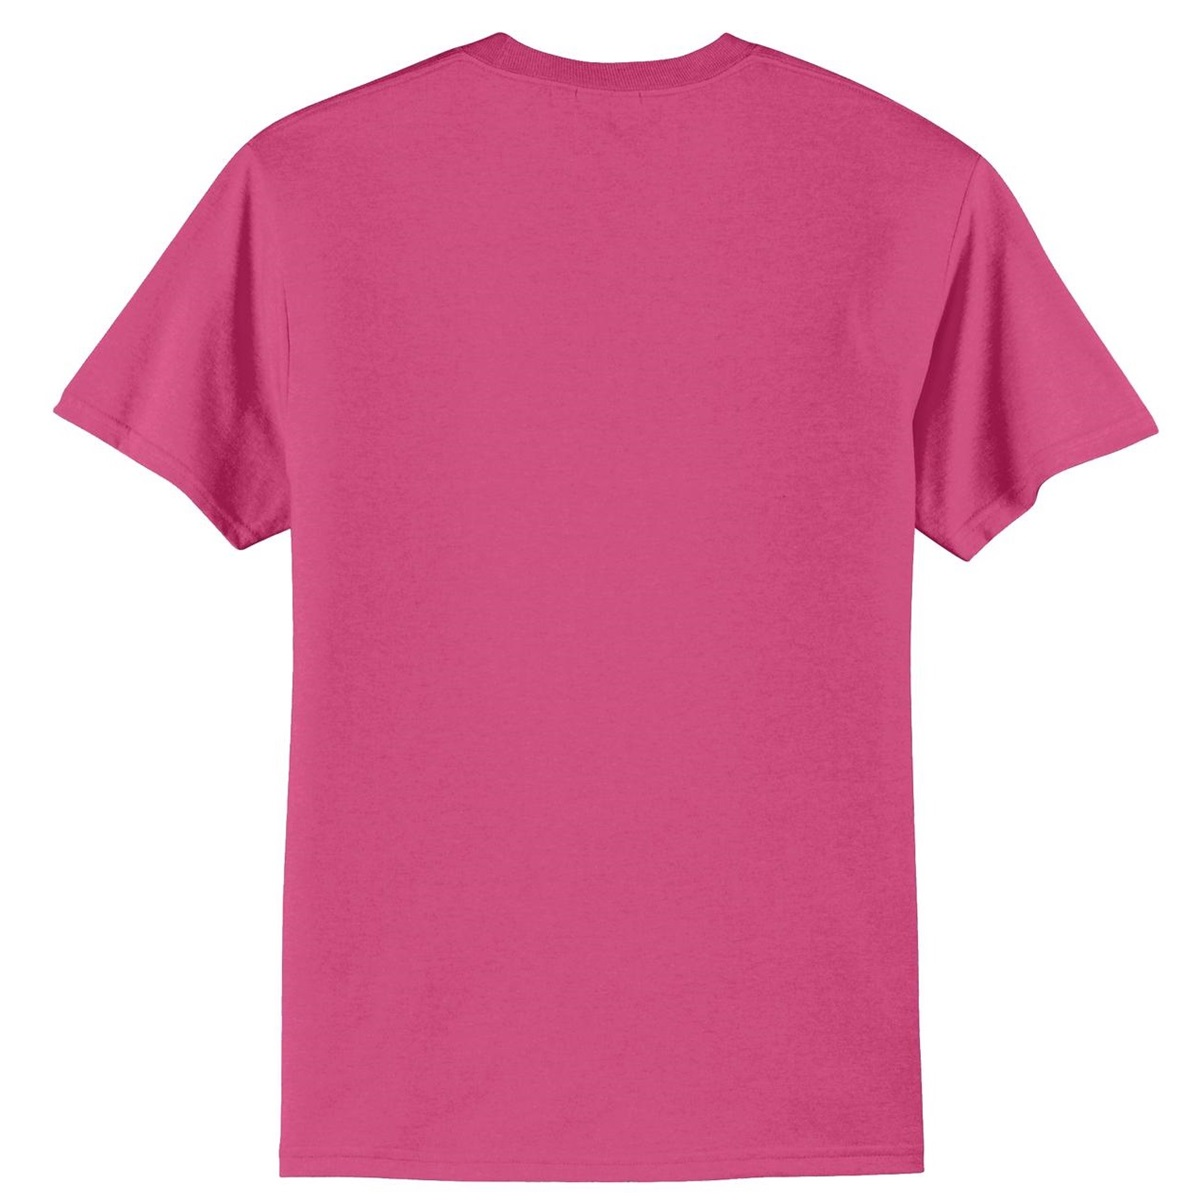 Screen Printing Basics Palm Desert: Port & Company PC55 50/50 Cotton/Poly T-Shirt